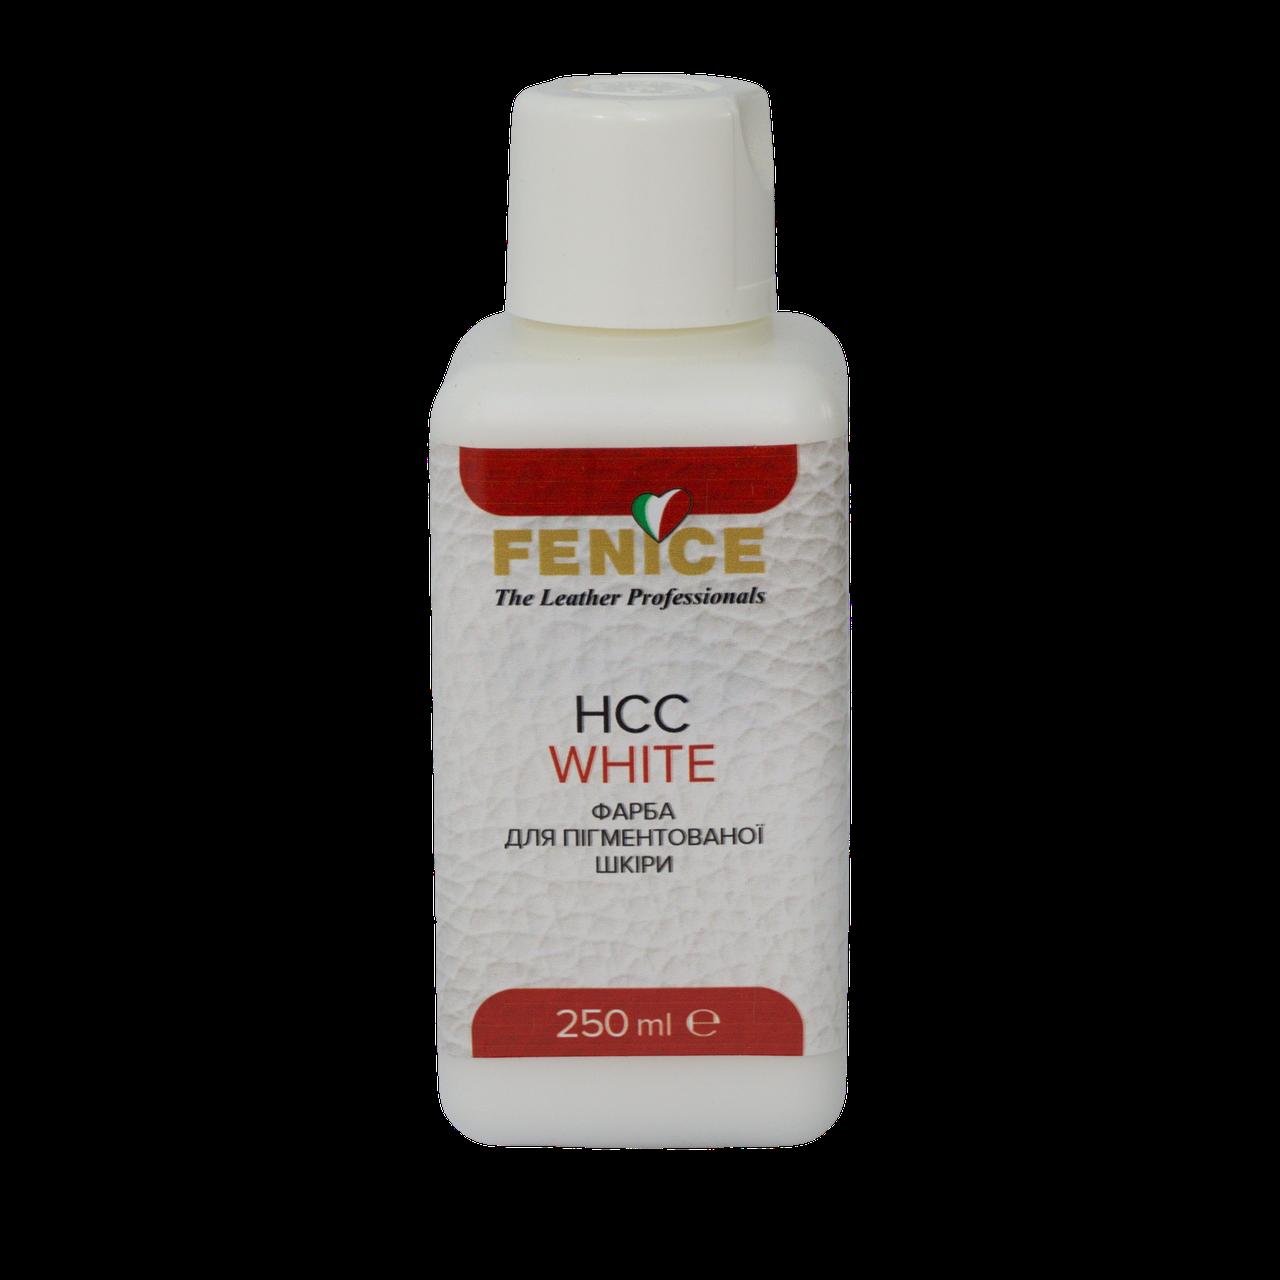 Краска для кожи Белая Fenice White HCC, 250 ml